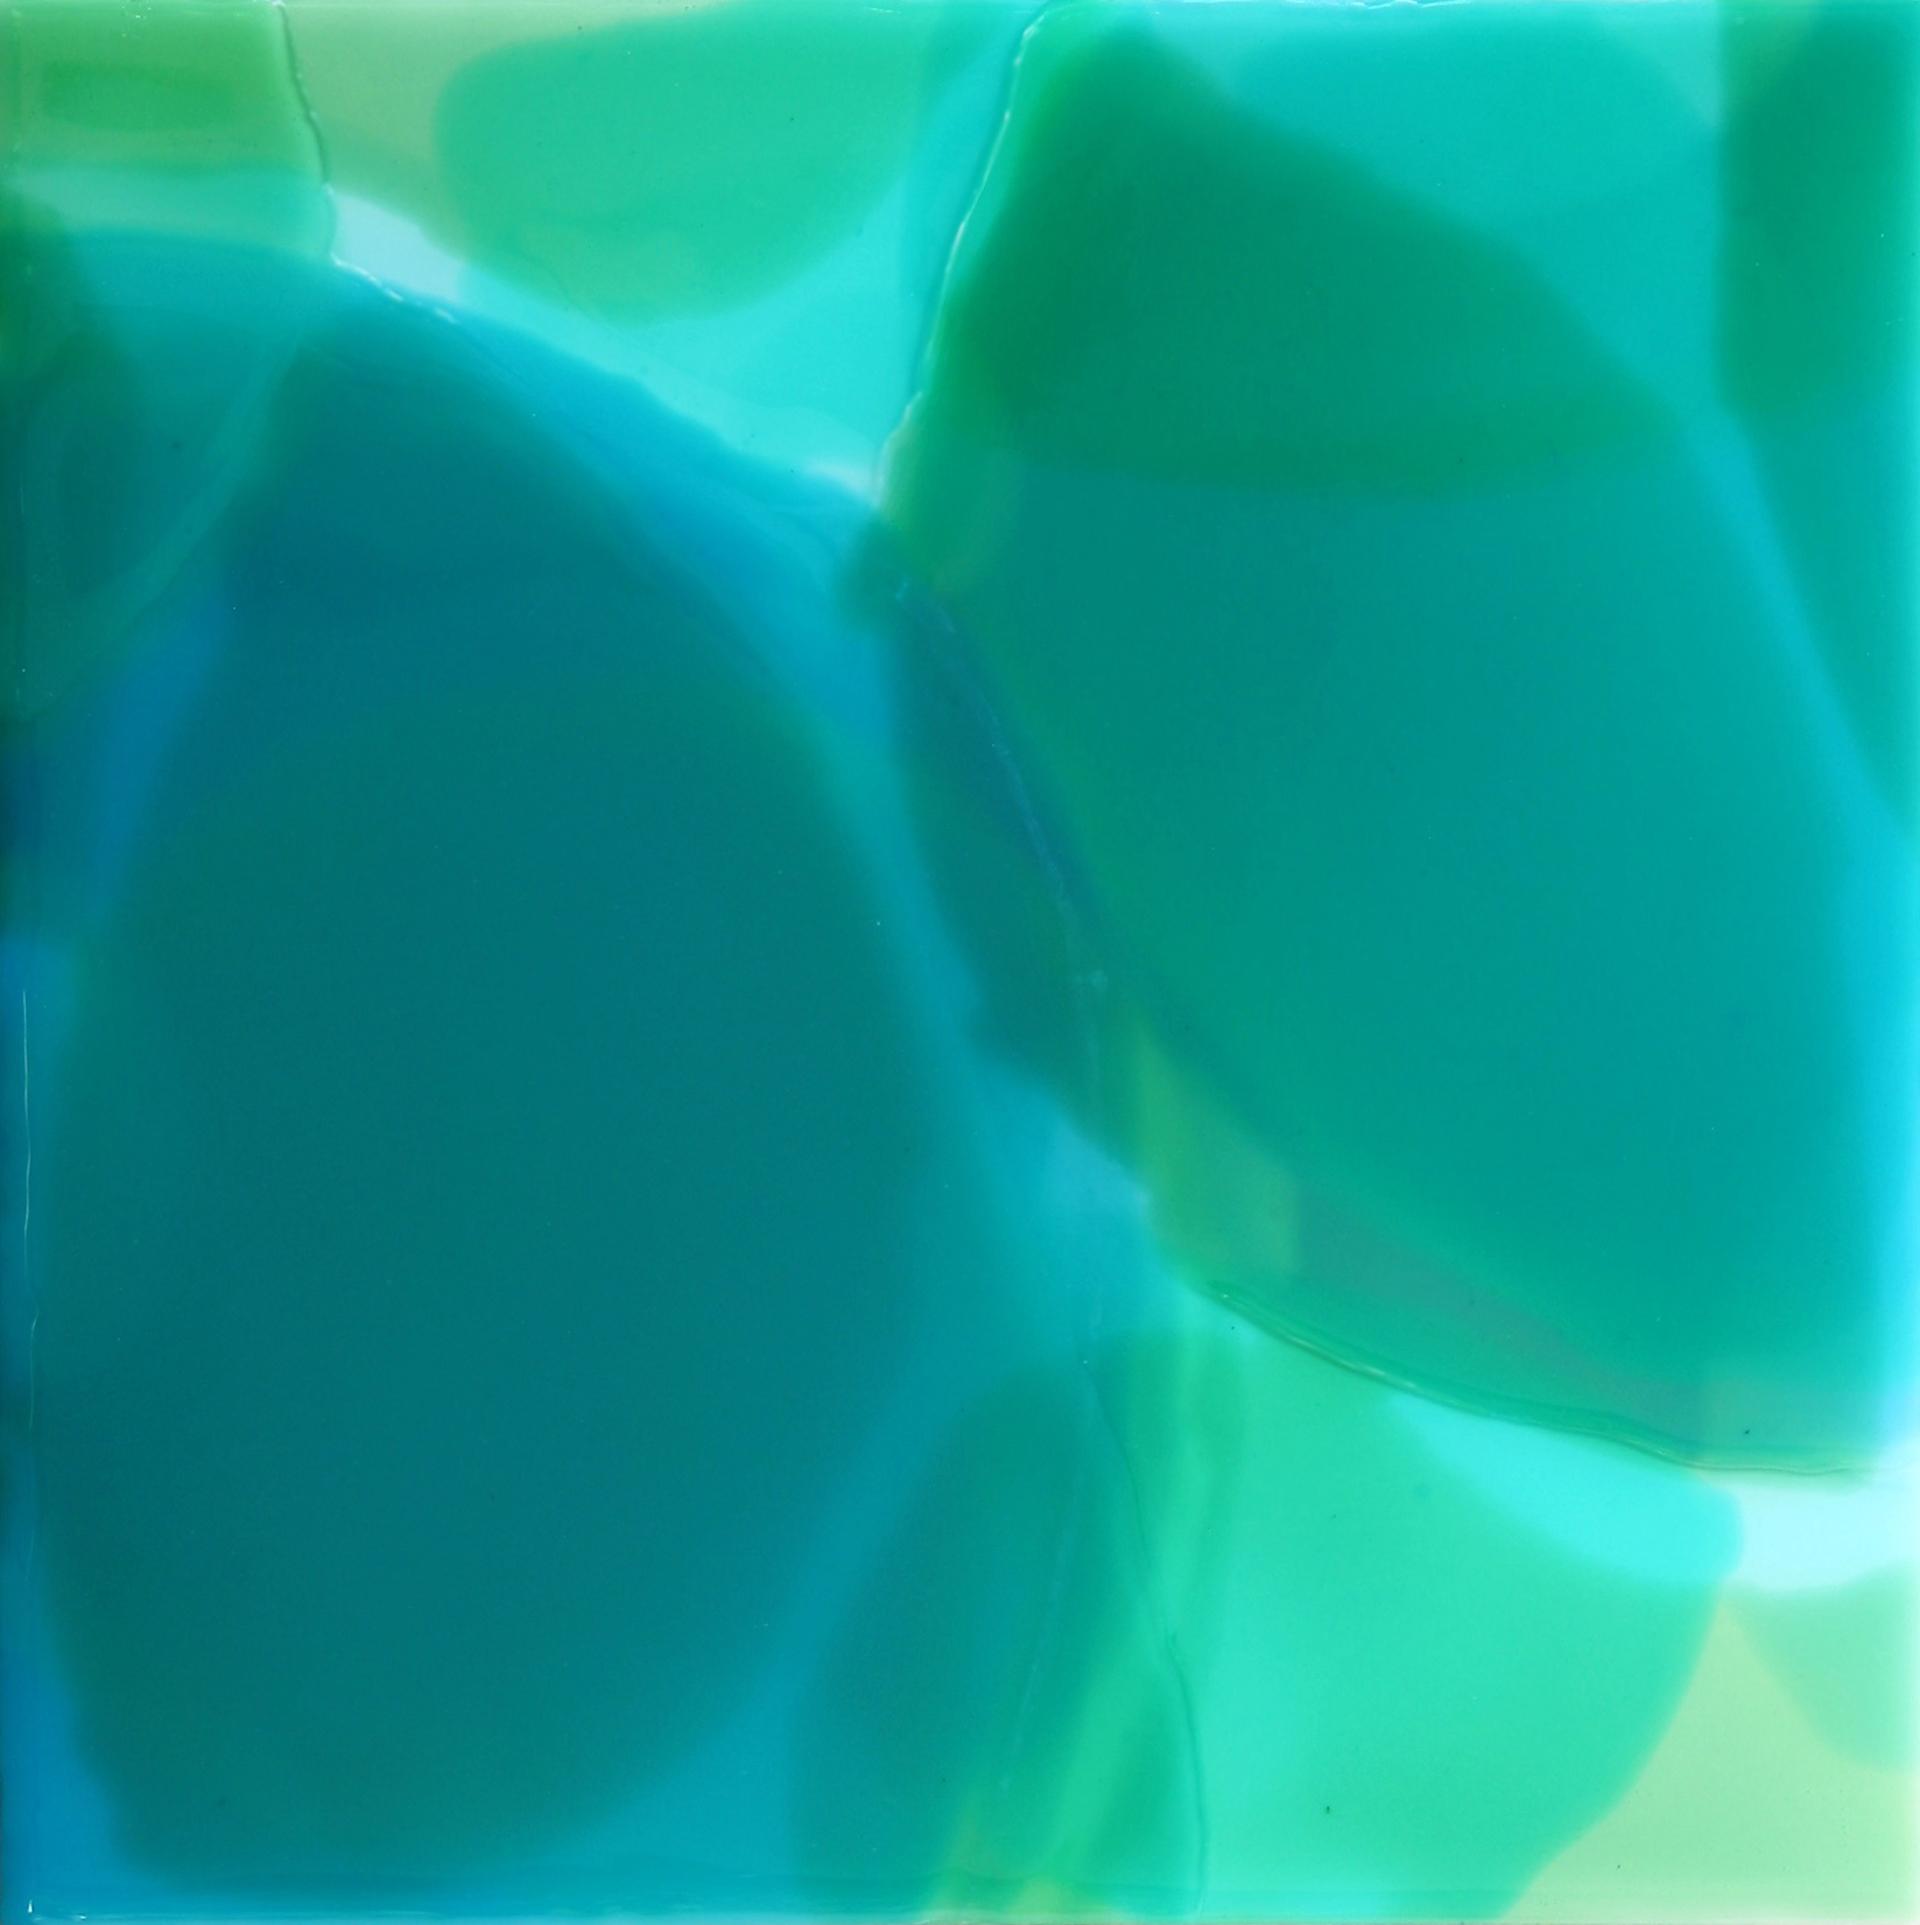 Blue-Green Square by Farida Hughes